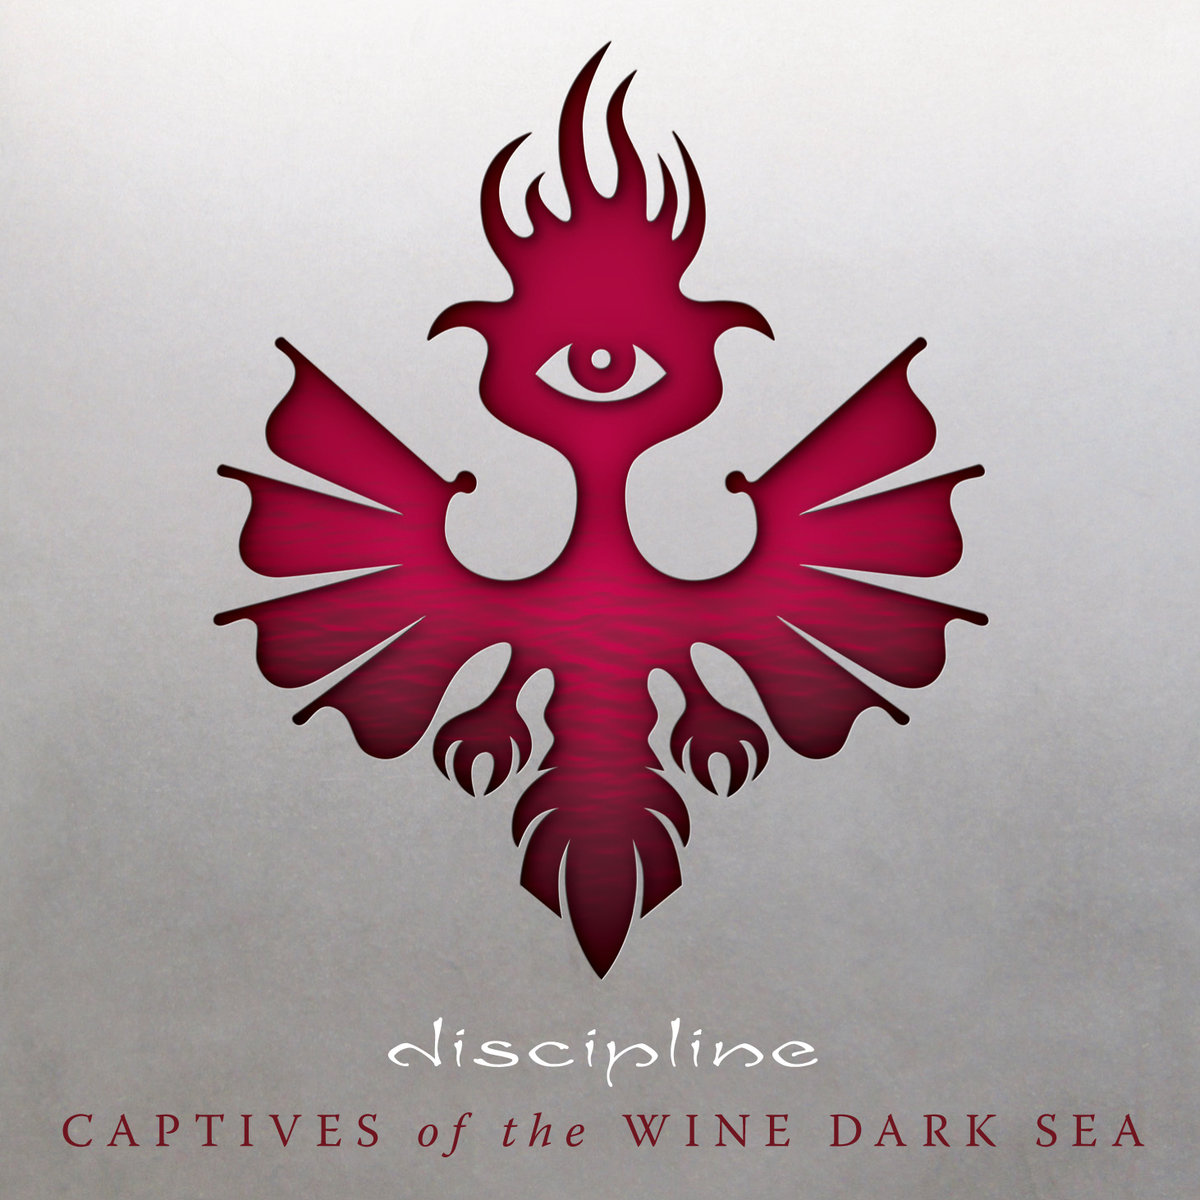 Discipline: Captives of the Wine Dark Sea